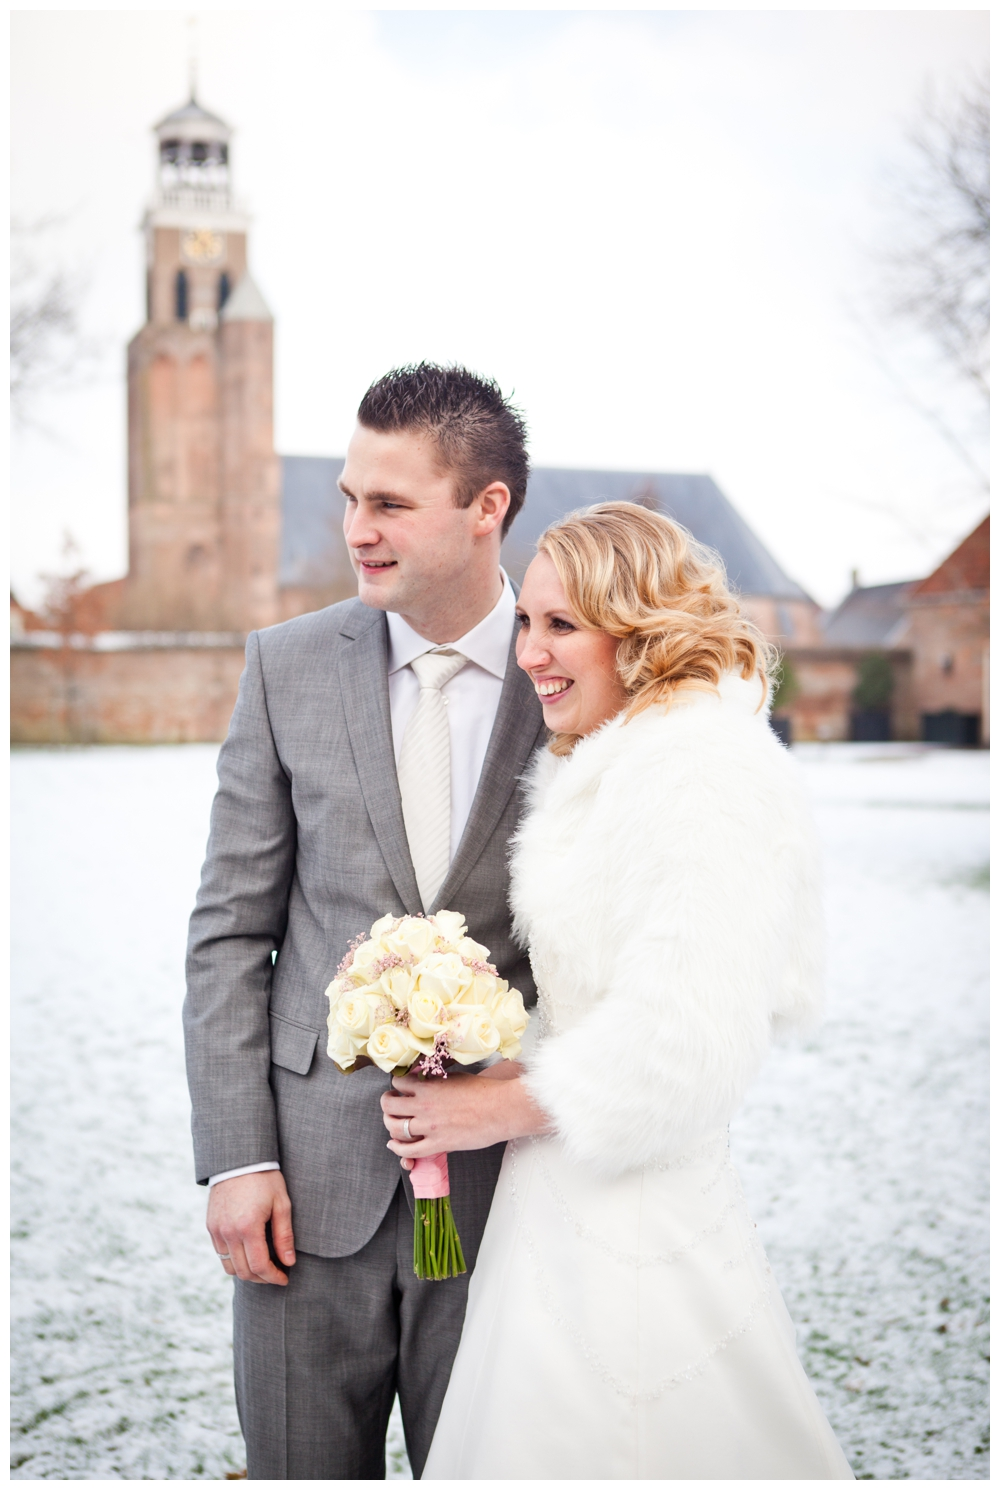 Wedding Robbert&Marlon KL123.jpg